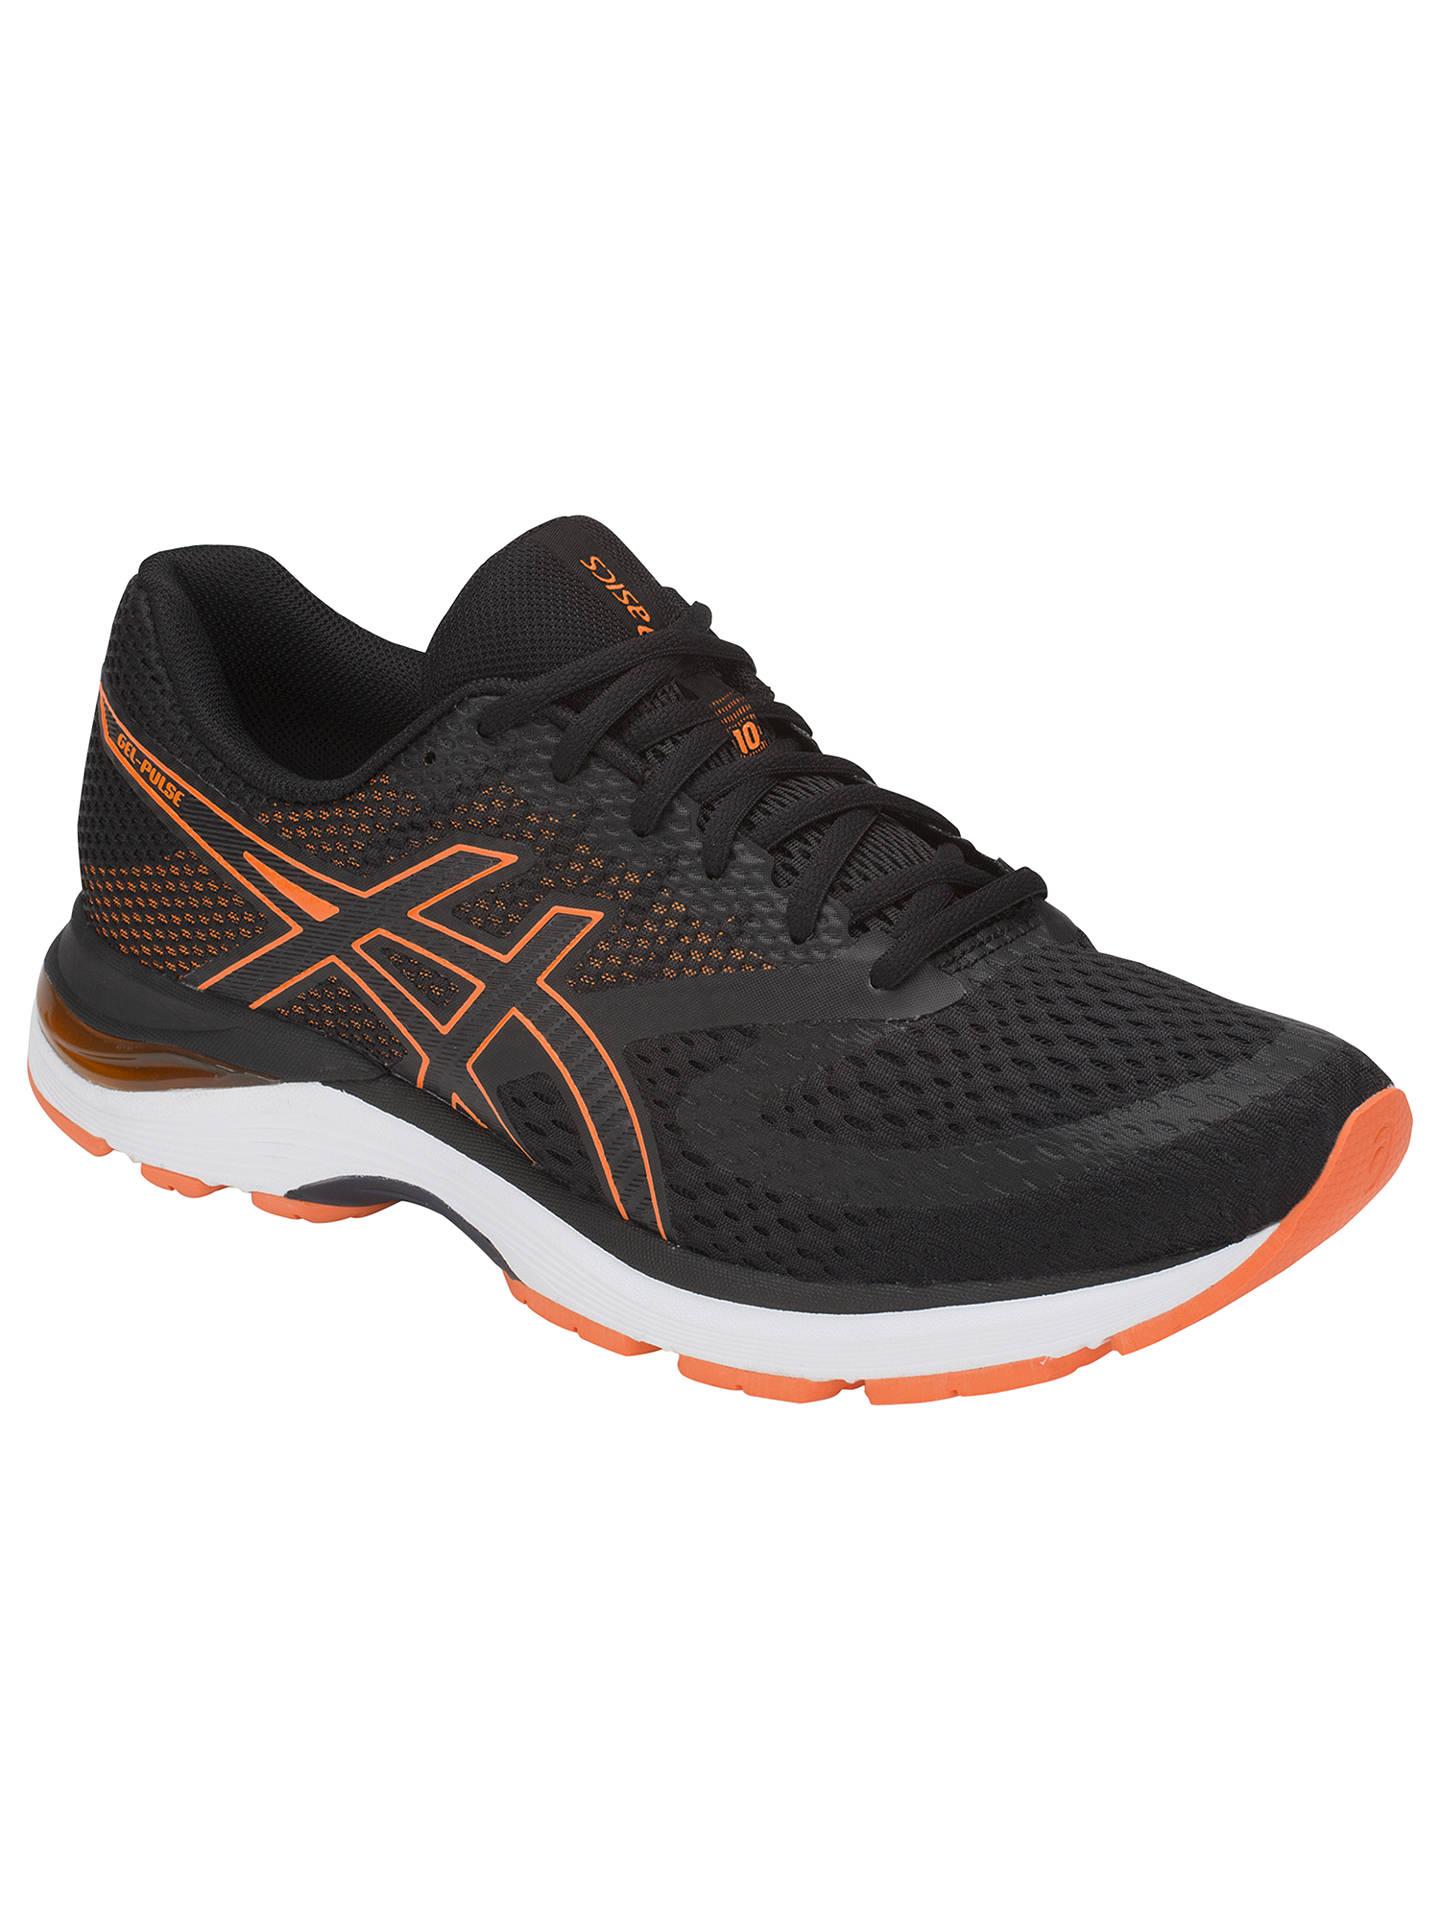 ASICS GEL-PULSE 10 Men's Running Shoes at John Lewis & Partners